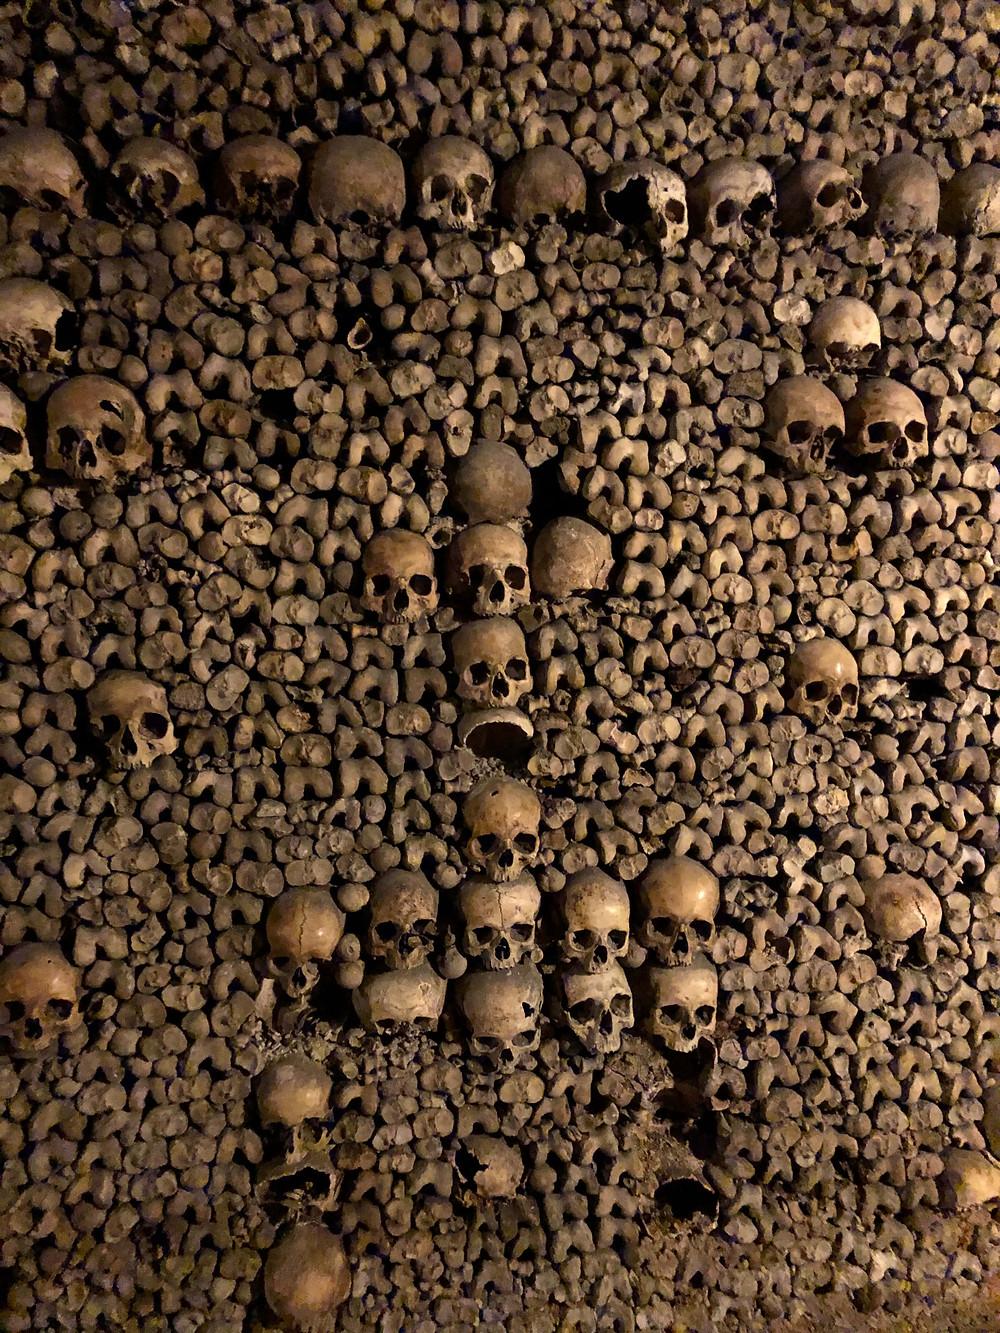 skull and bones Catacombs display Paris